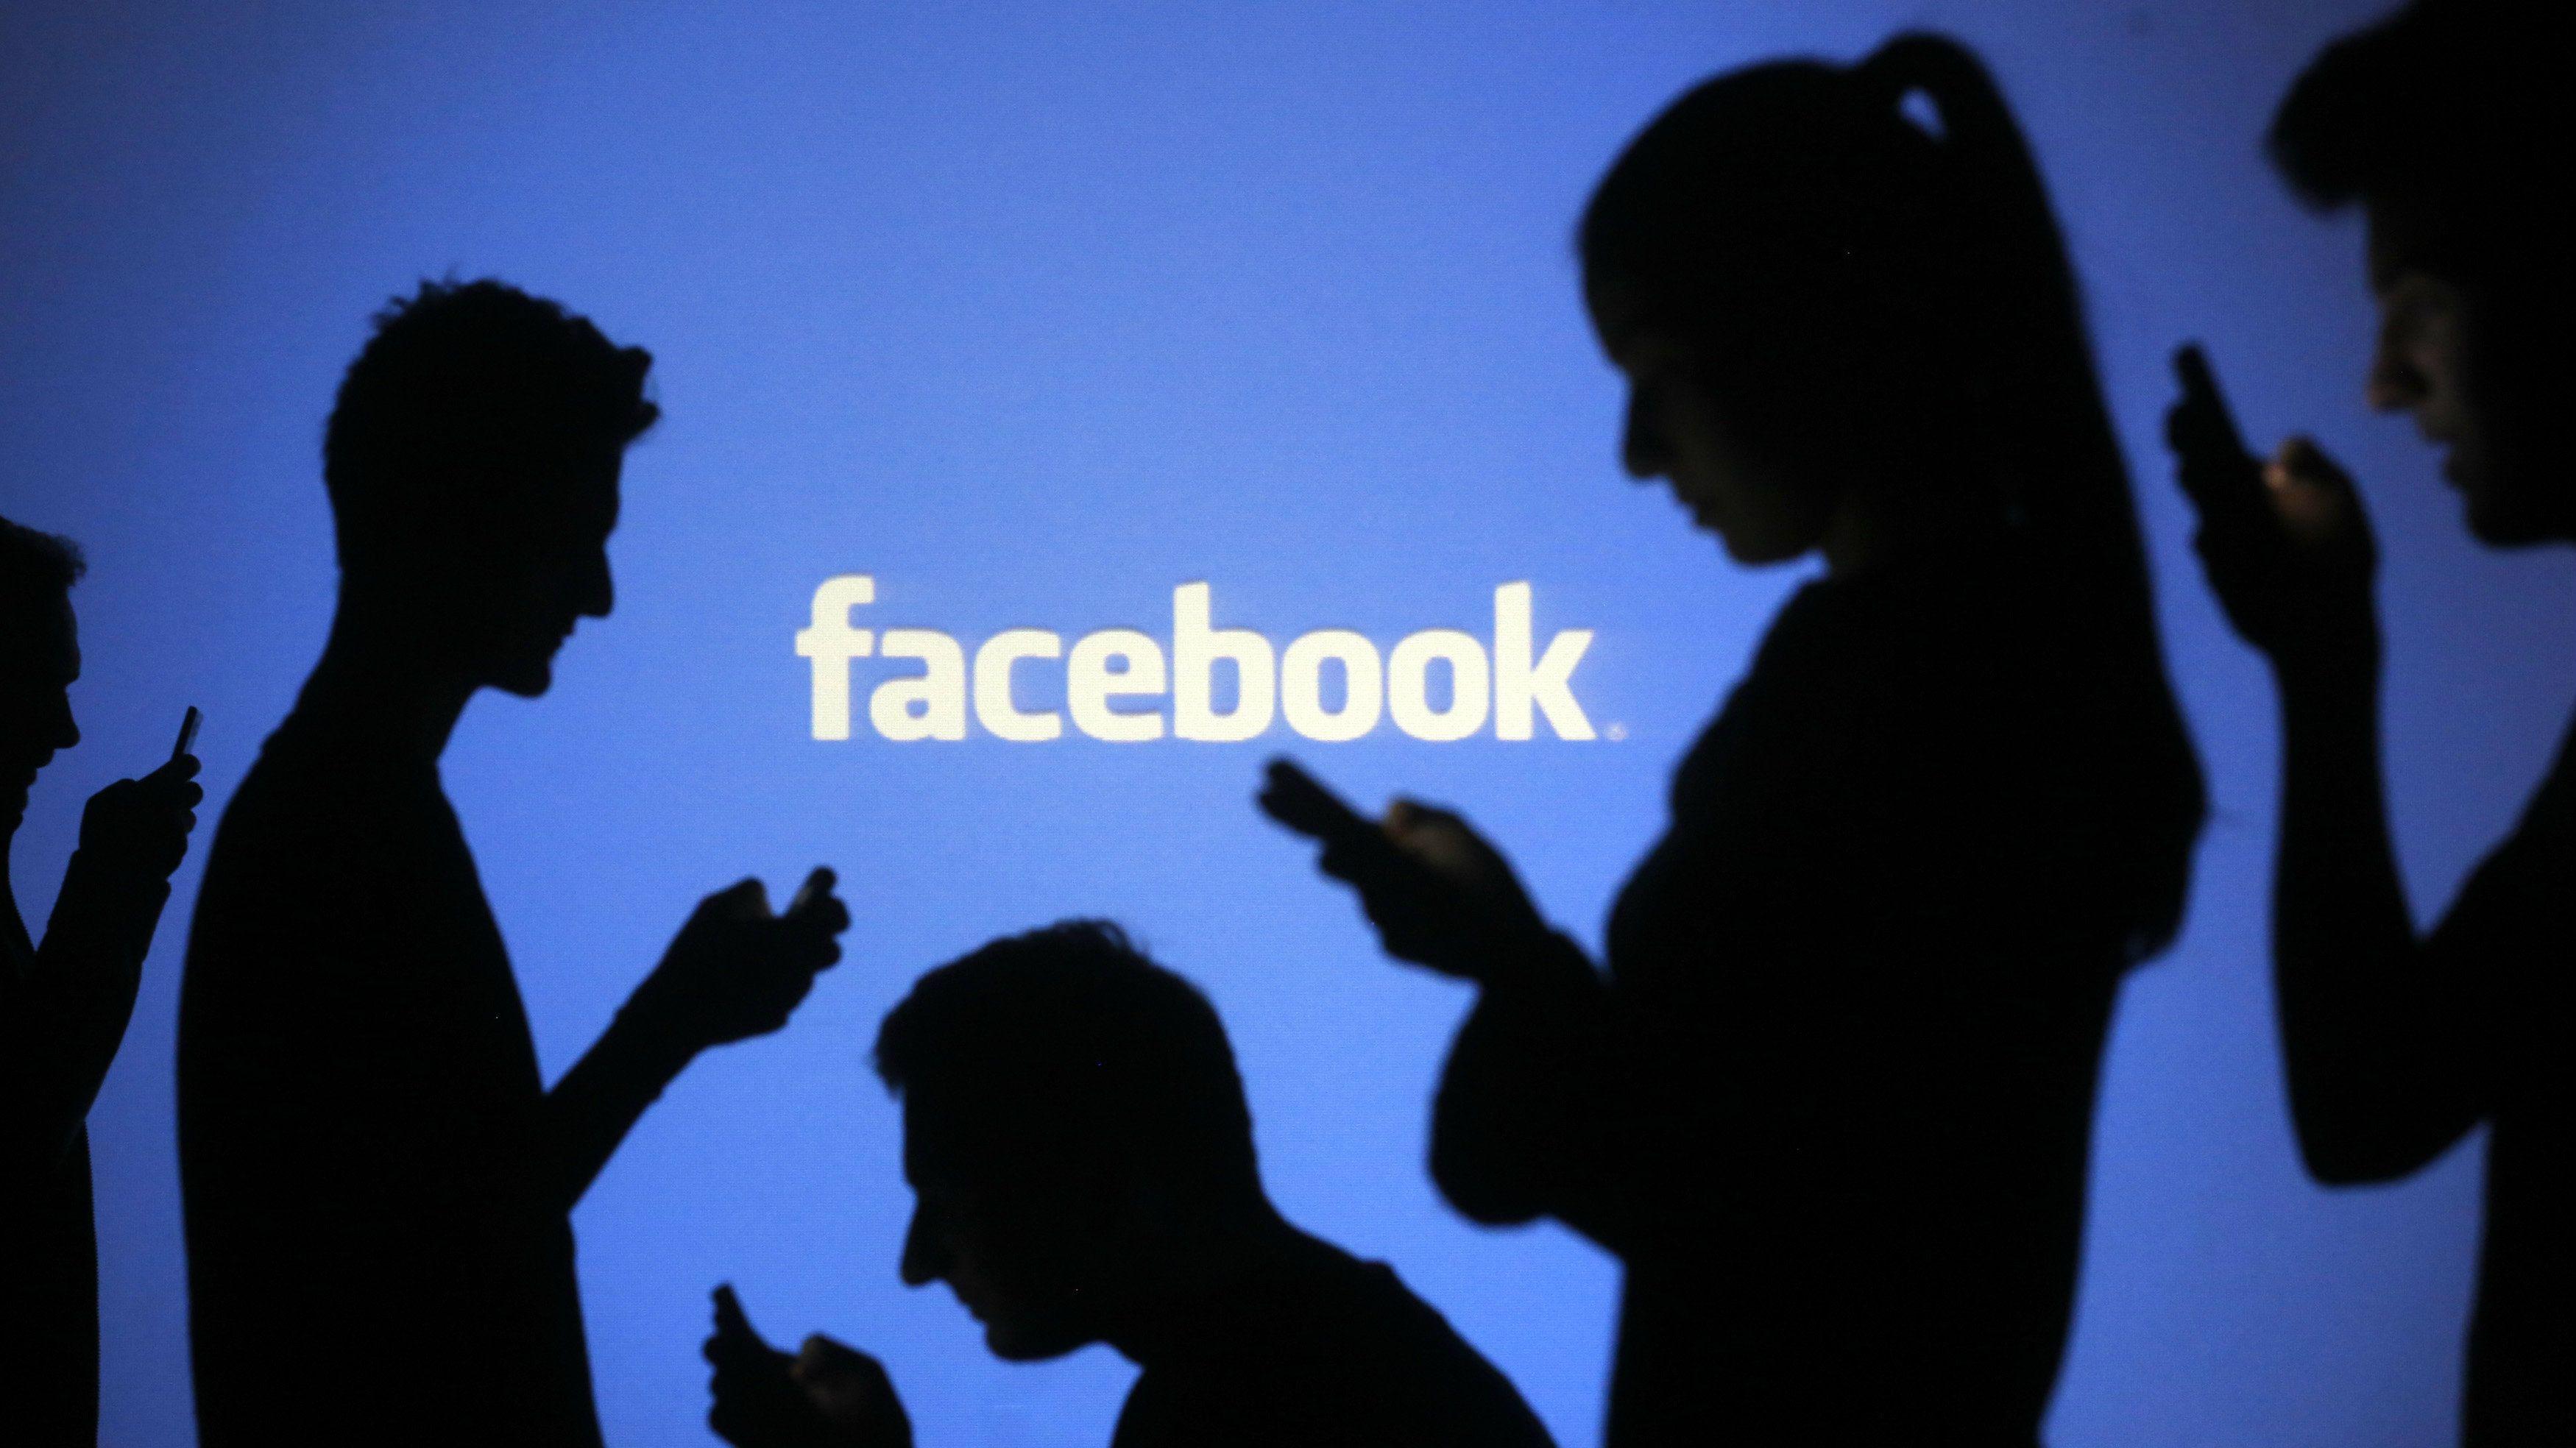 Folha deixa de publicar conteúdo no Facebook